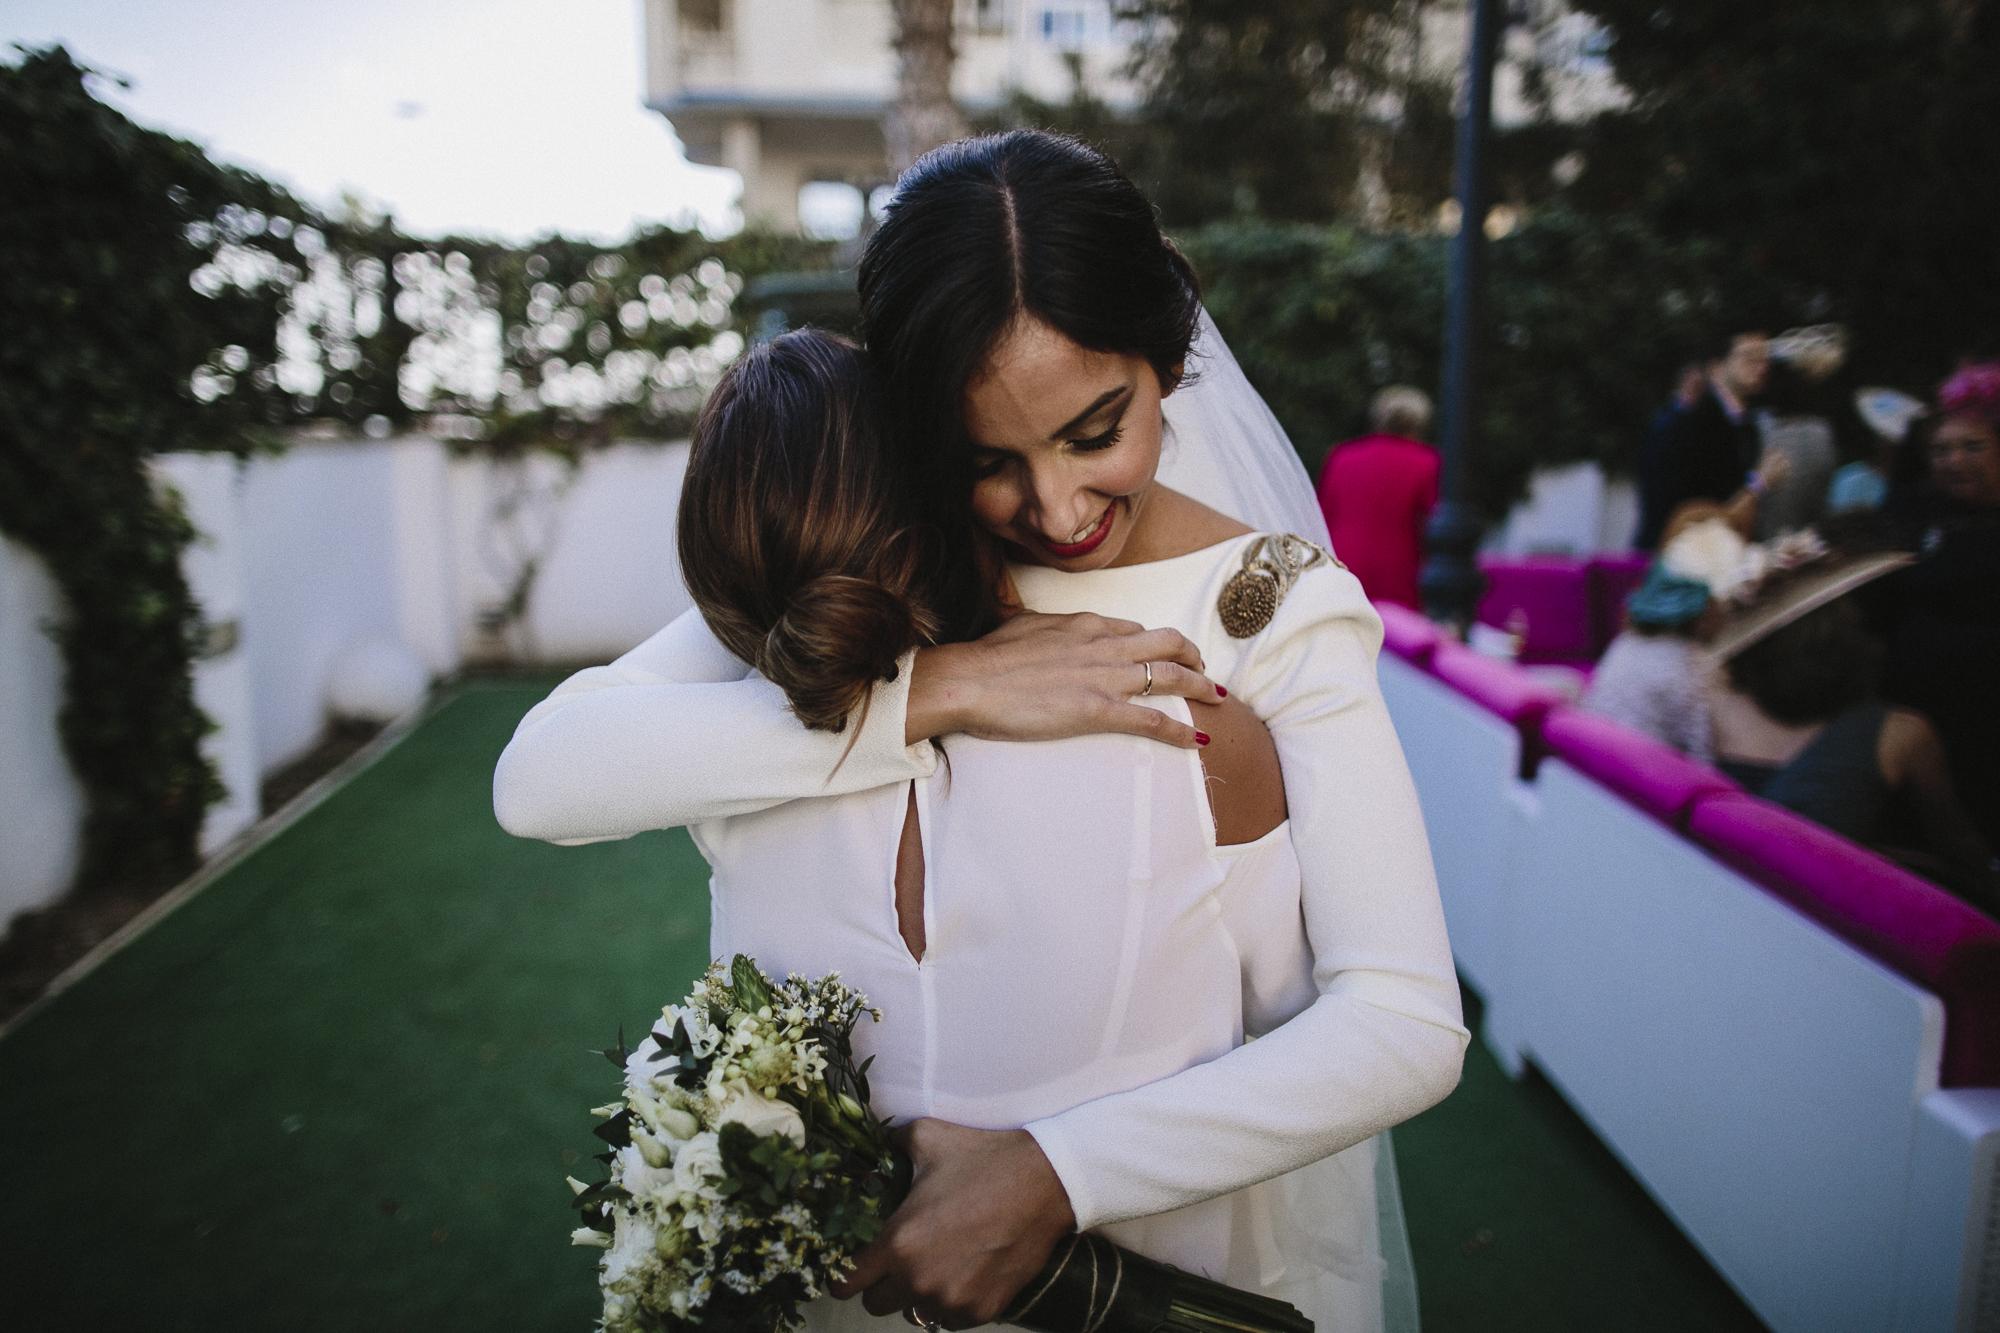 alfonso_flores_destination_wedding_photogrpaher_españa-93.jpg